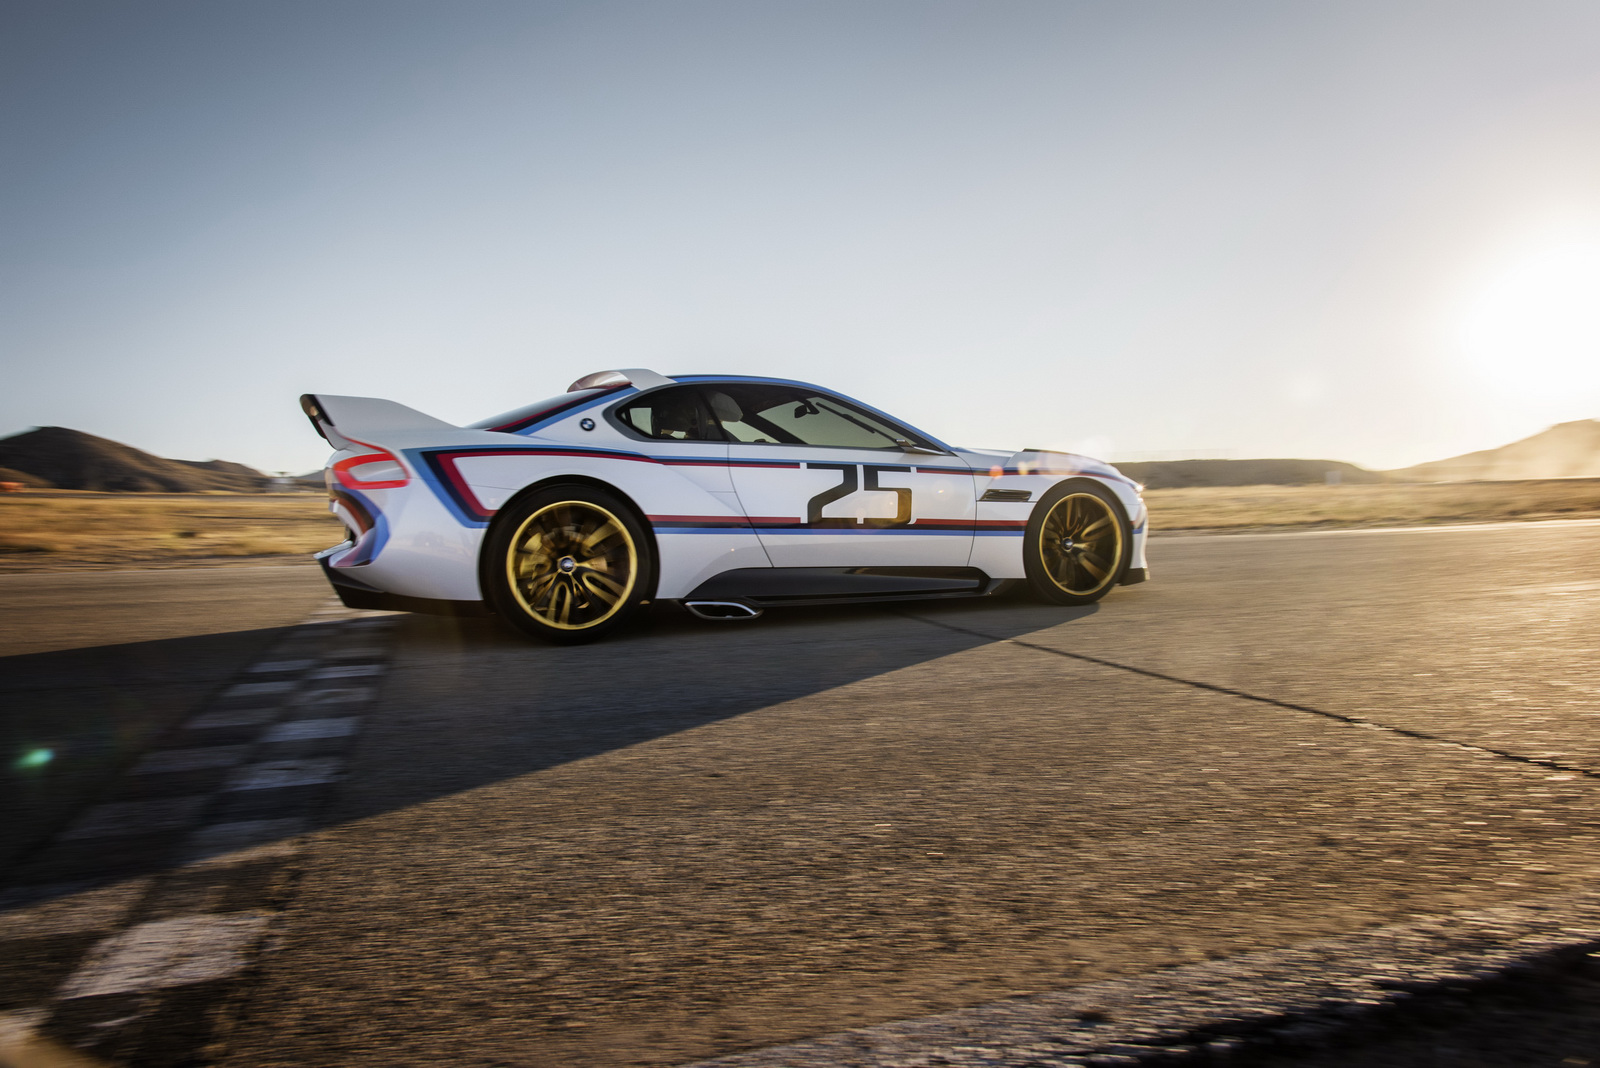 BMW-30-Hommage-R-Concept-20